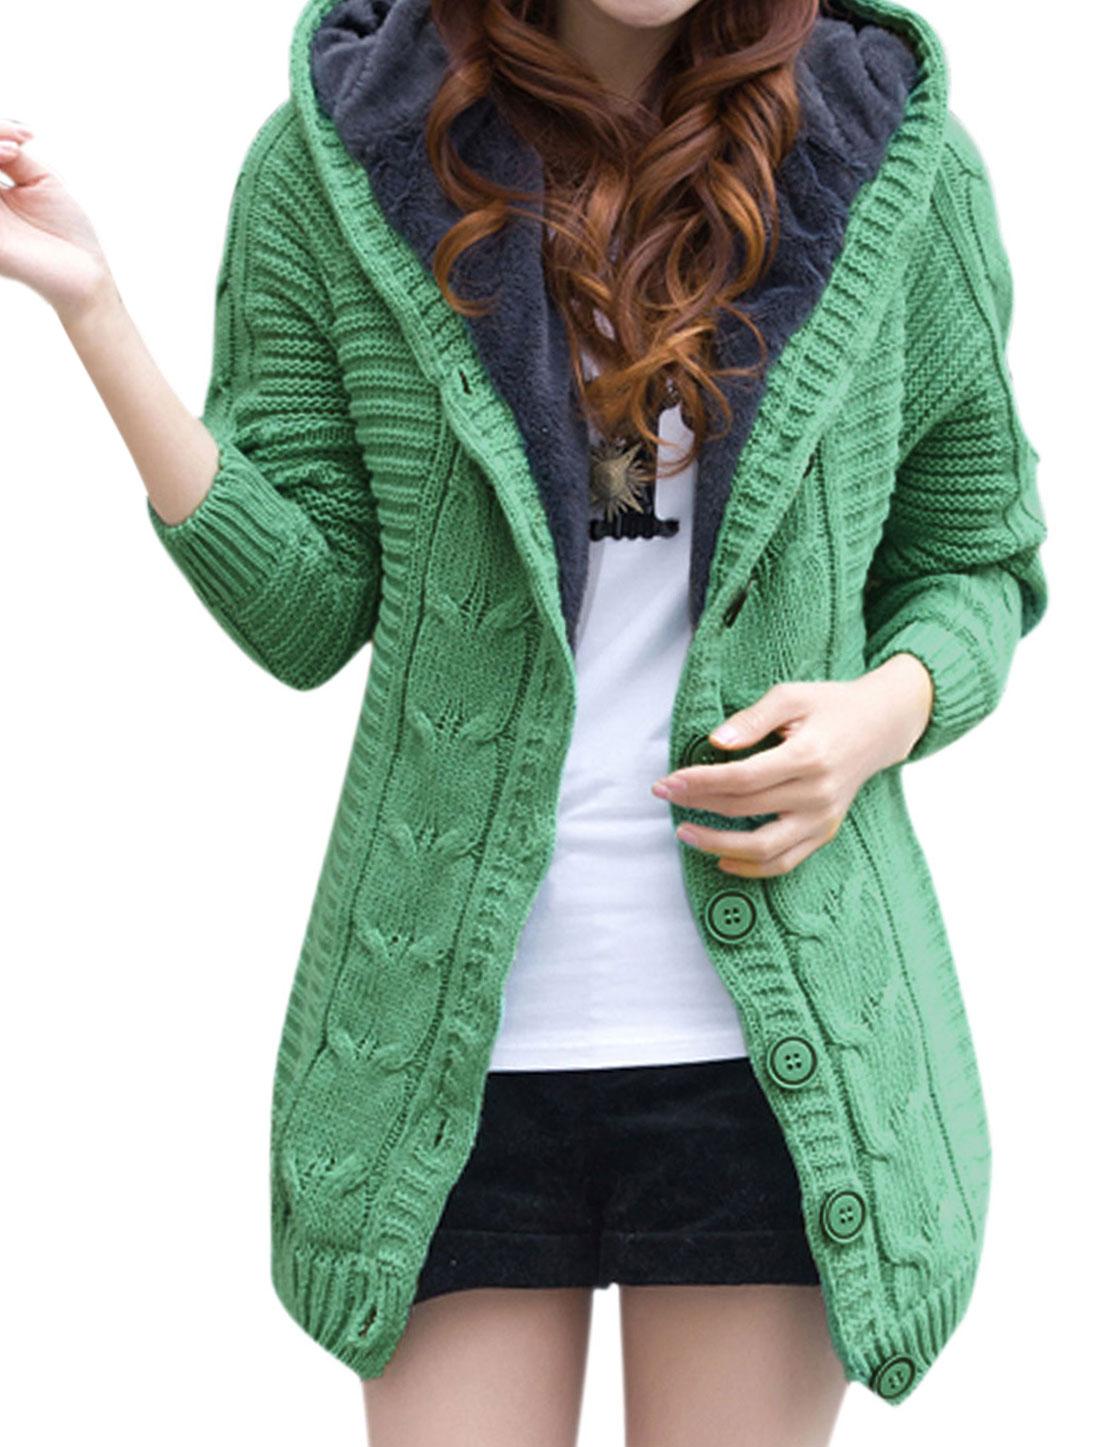 Women Buttons Closure Fleece Lined Hooded Knitted Cardigan Light Green XS